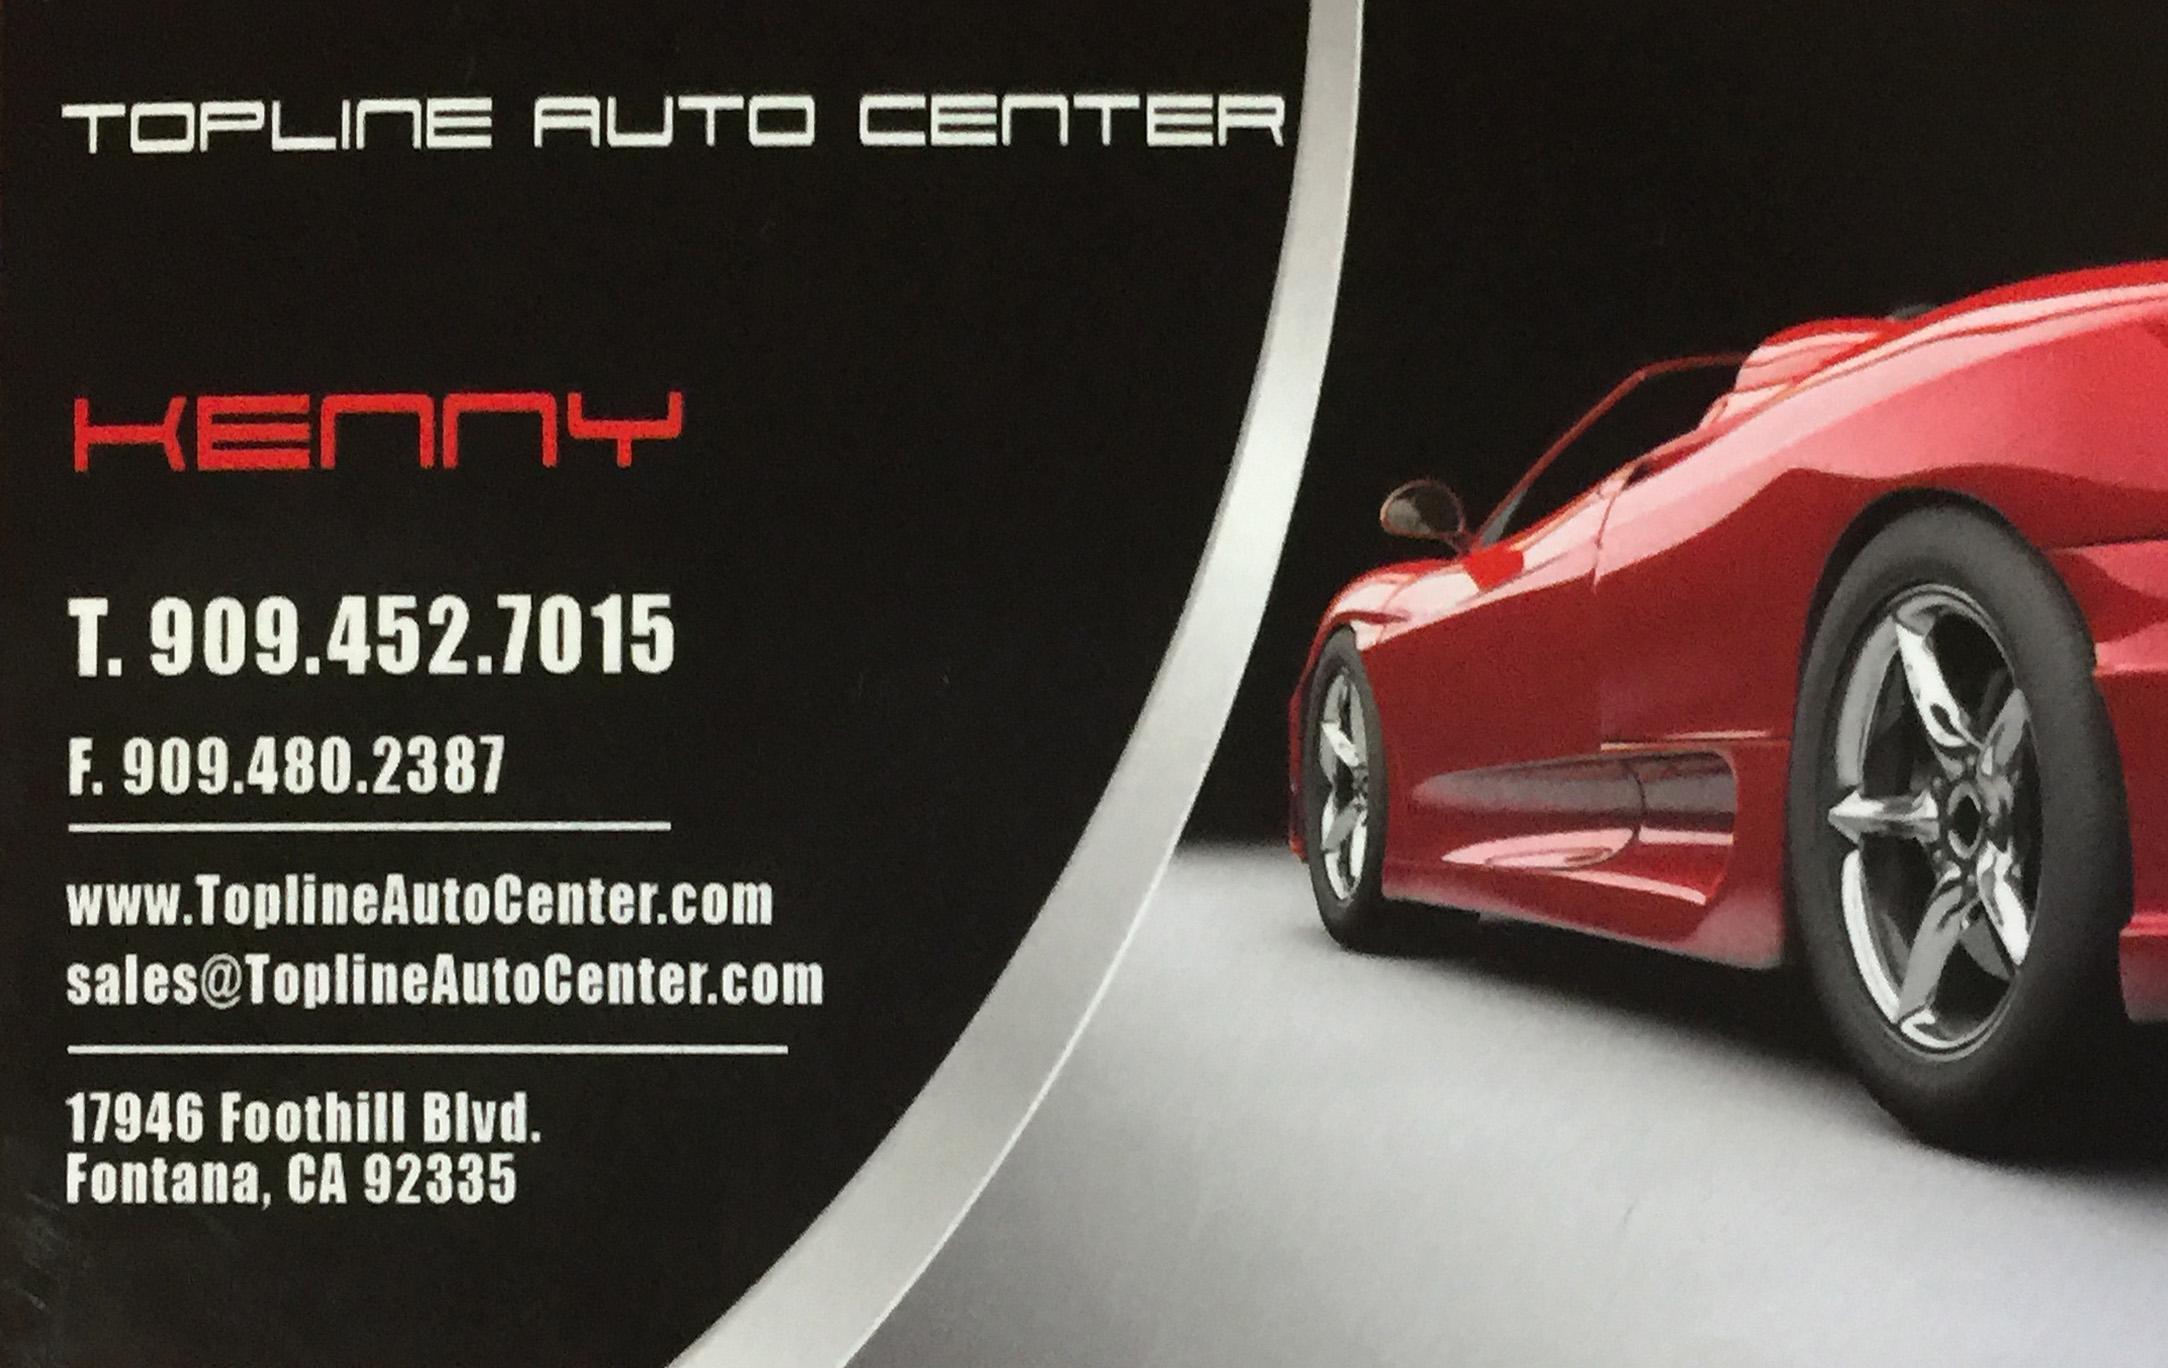 Topline Auto Center